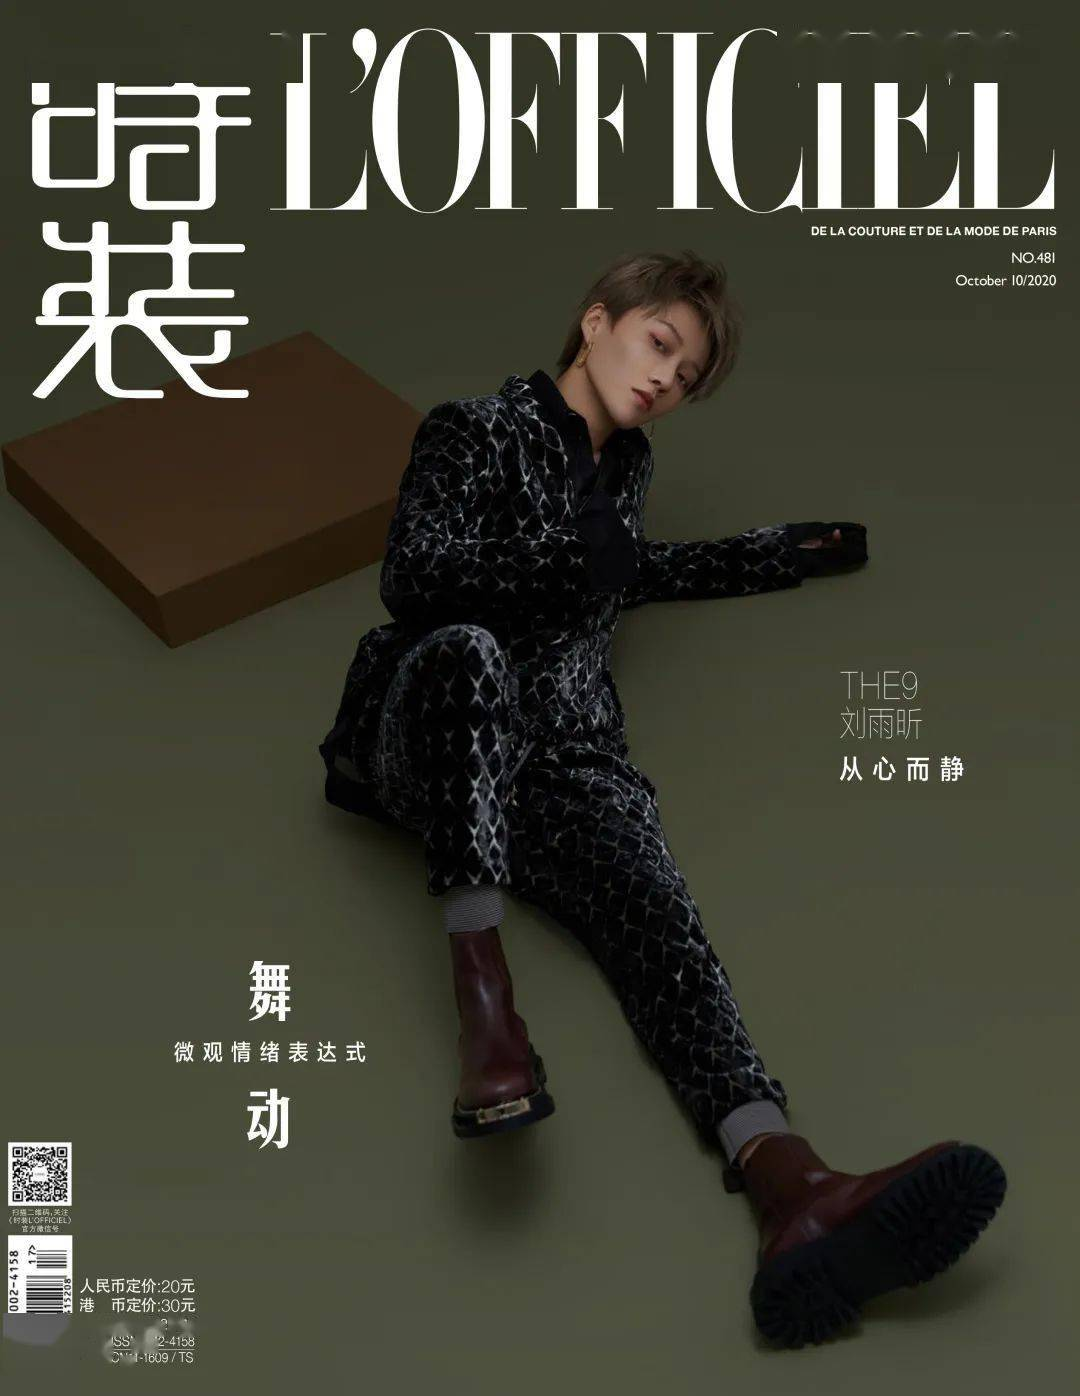 THE9-刘雨昕 从心而静 | 封面明星  span class=